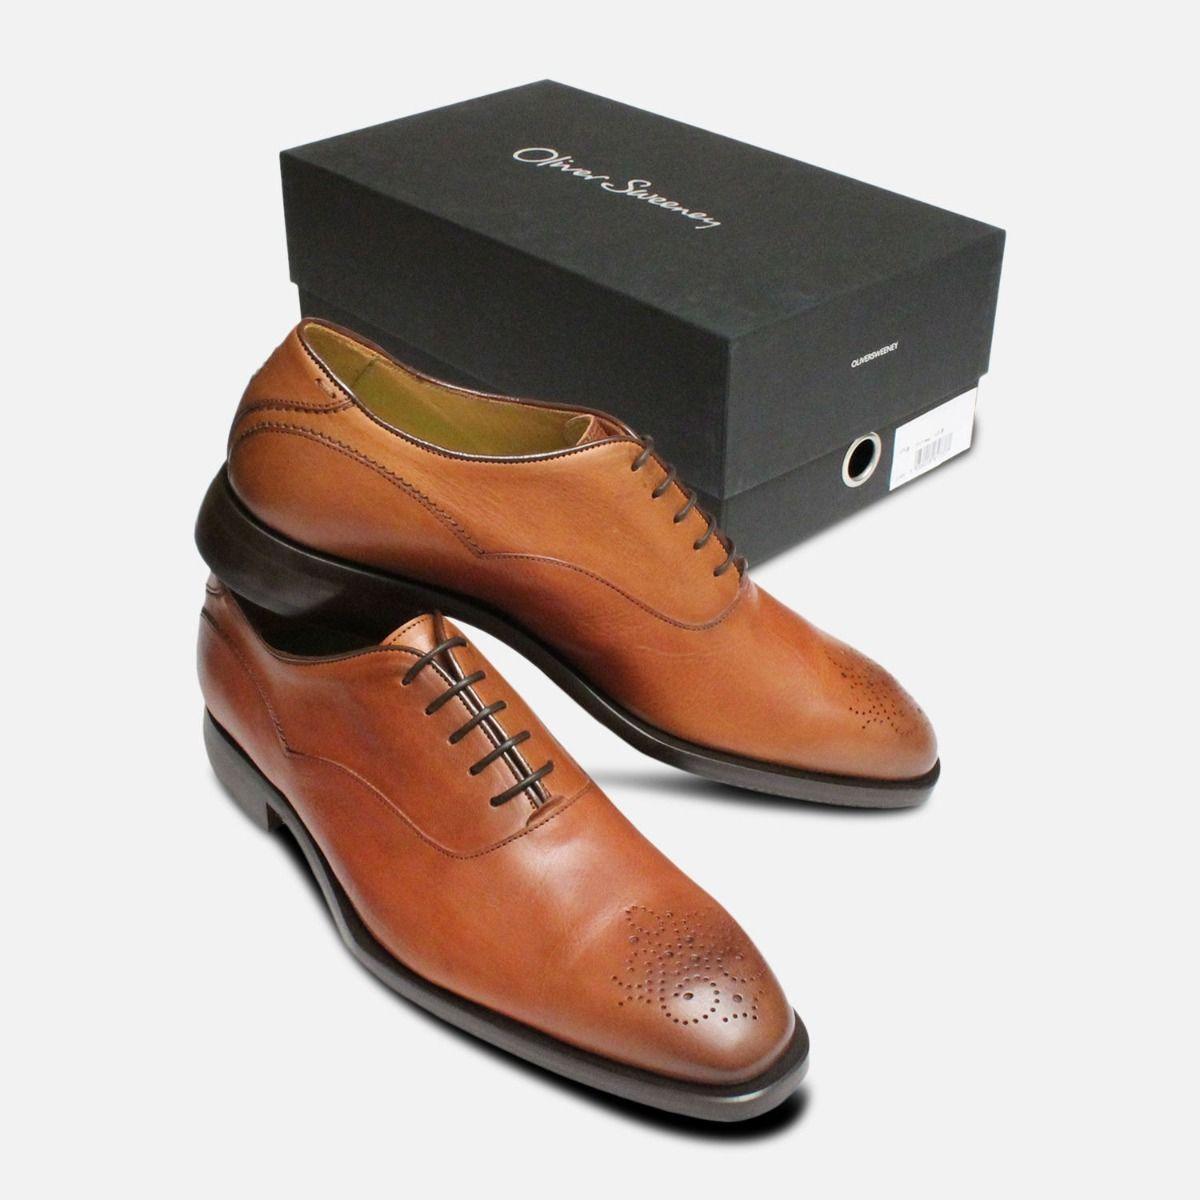 Oliver Sweeney Shoes Sabatini Cognac Brogues